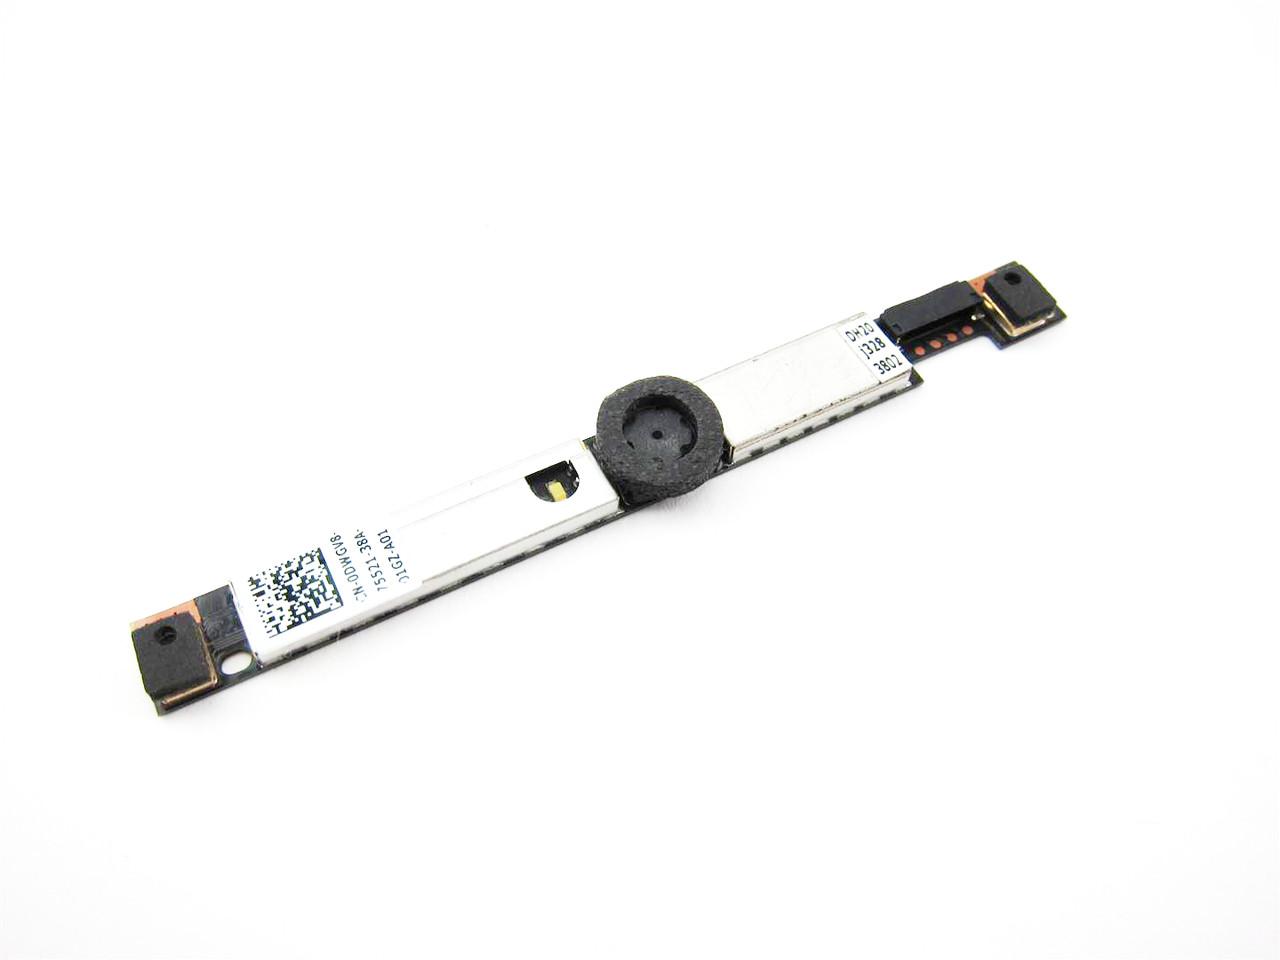 Dell Inspiron 11 3135 / 3137 / 3138 / 15 7537 Web Camera Replacement - DWGV8